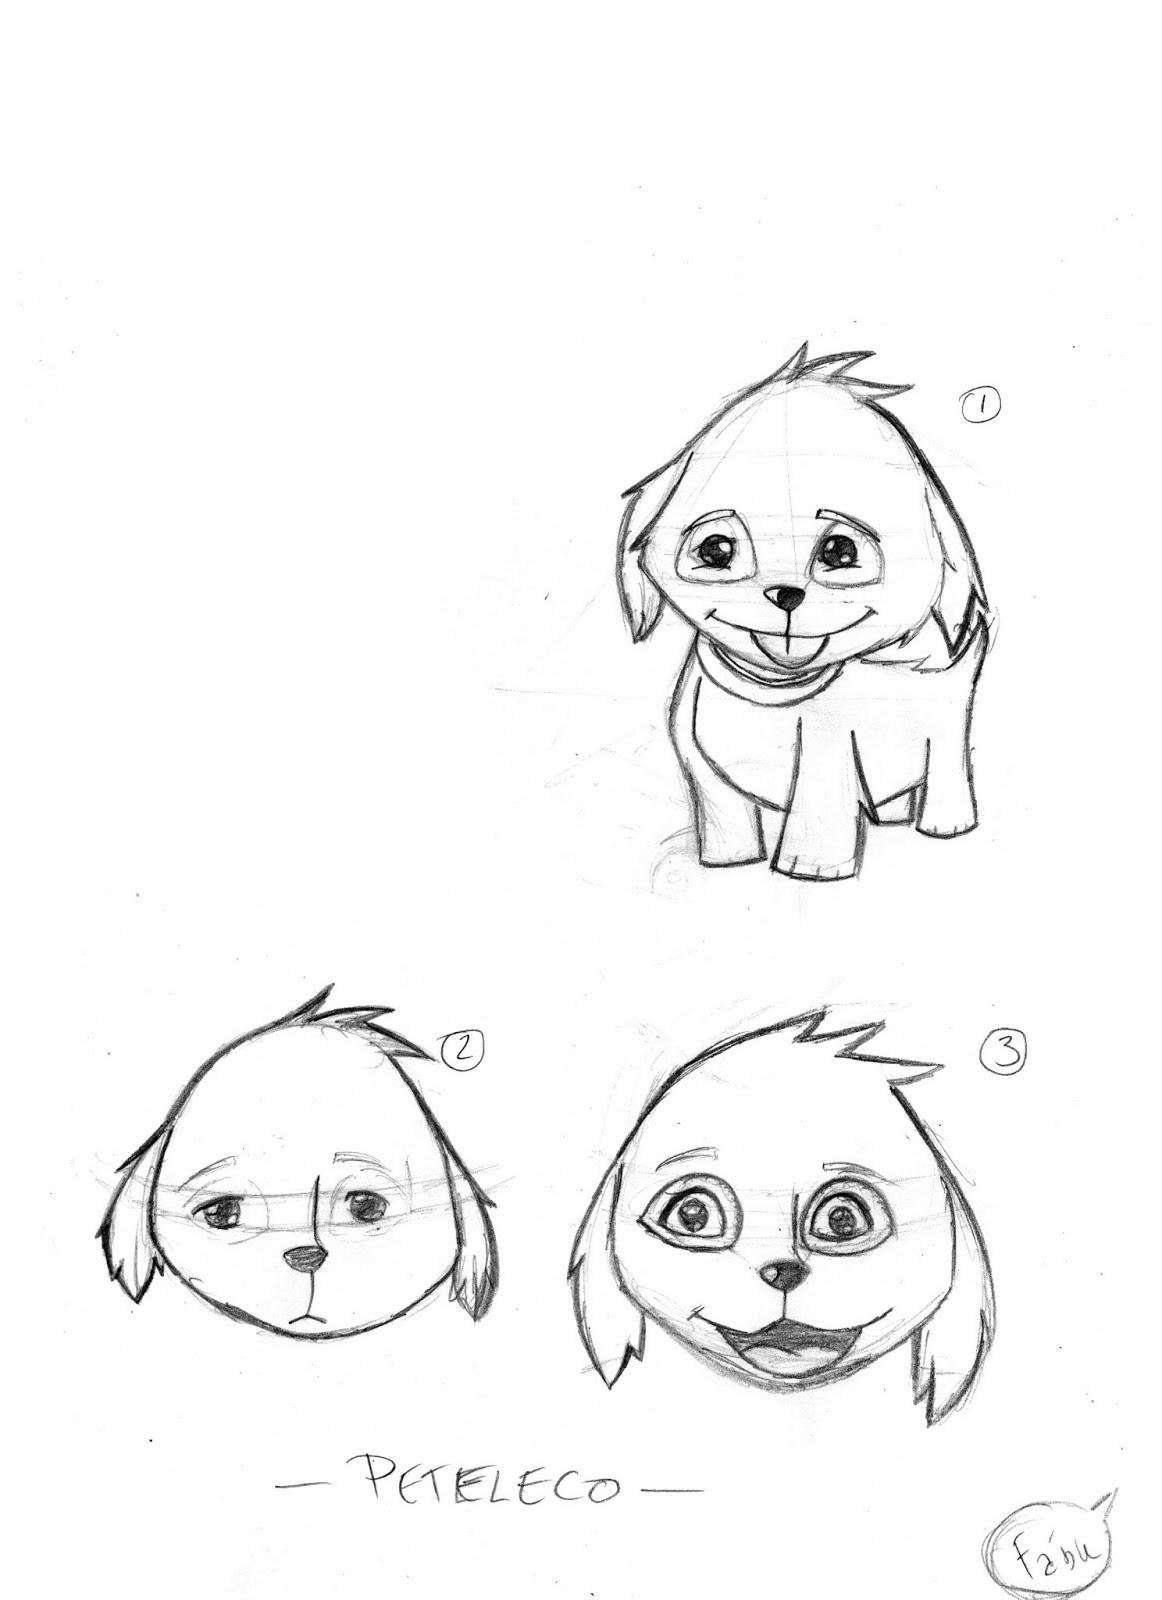 lionel coloring pages - photo#11